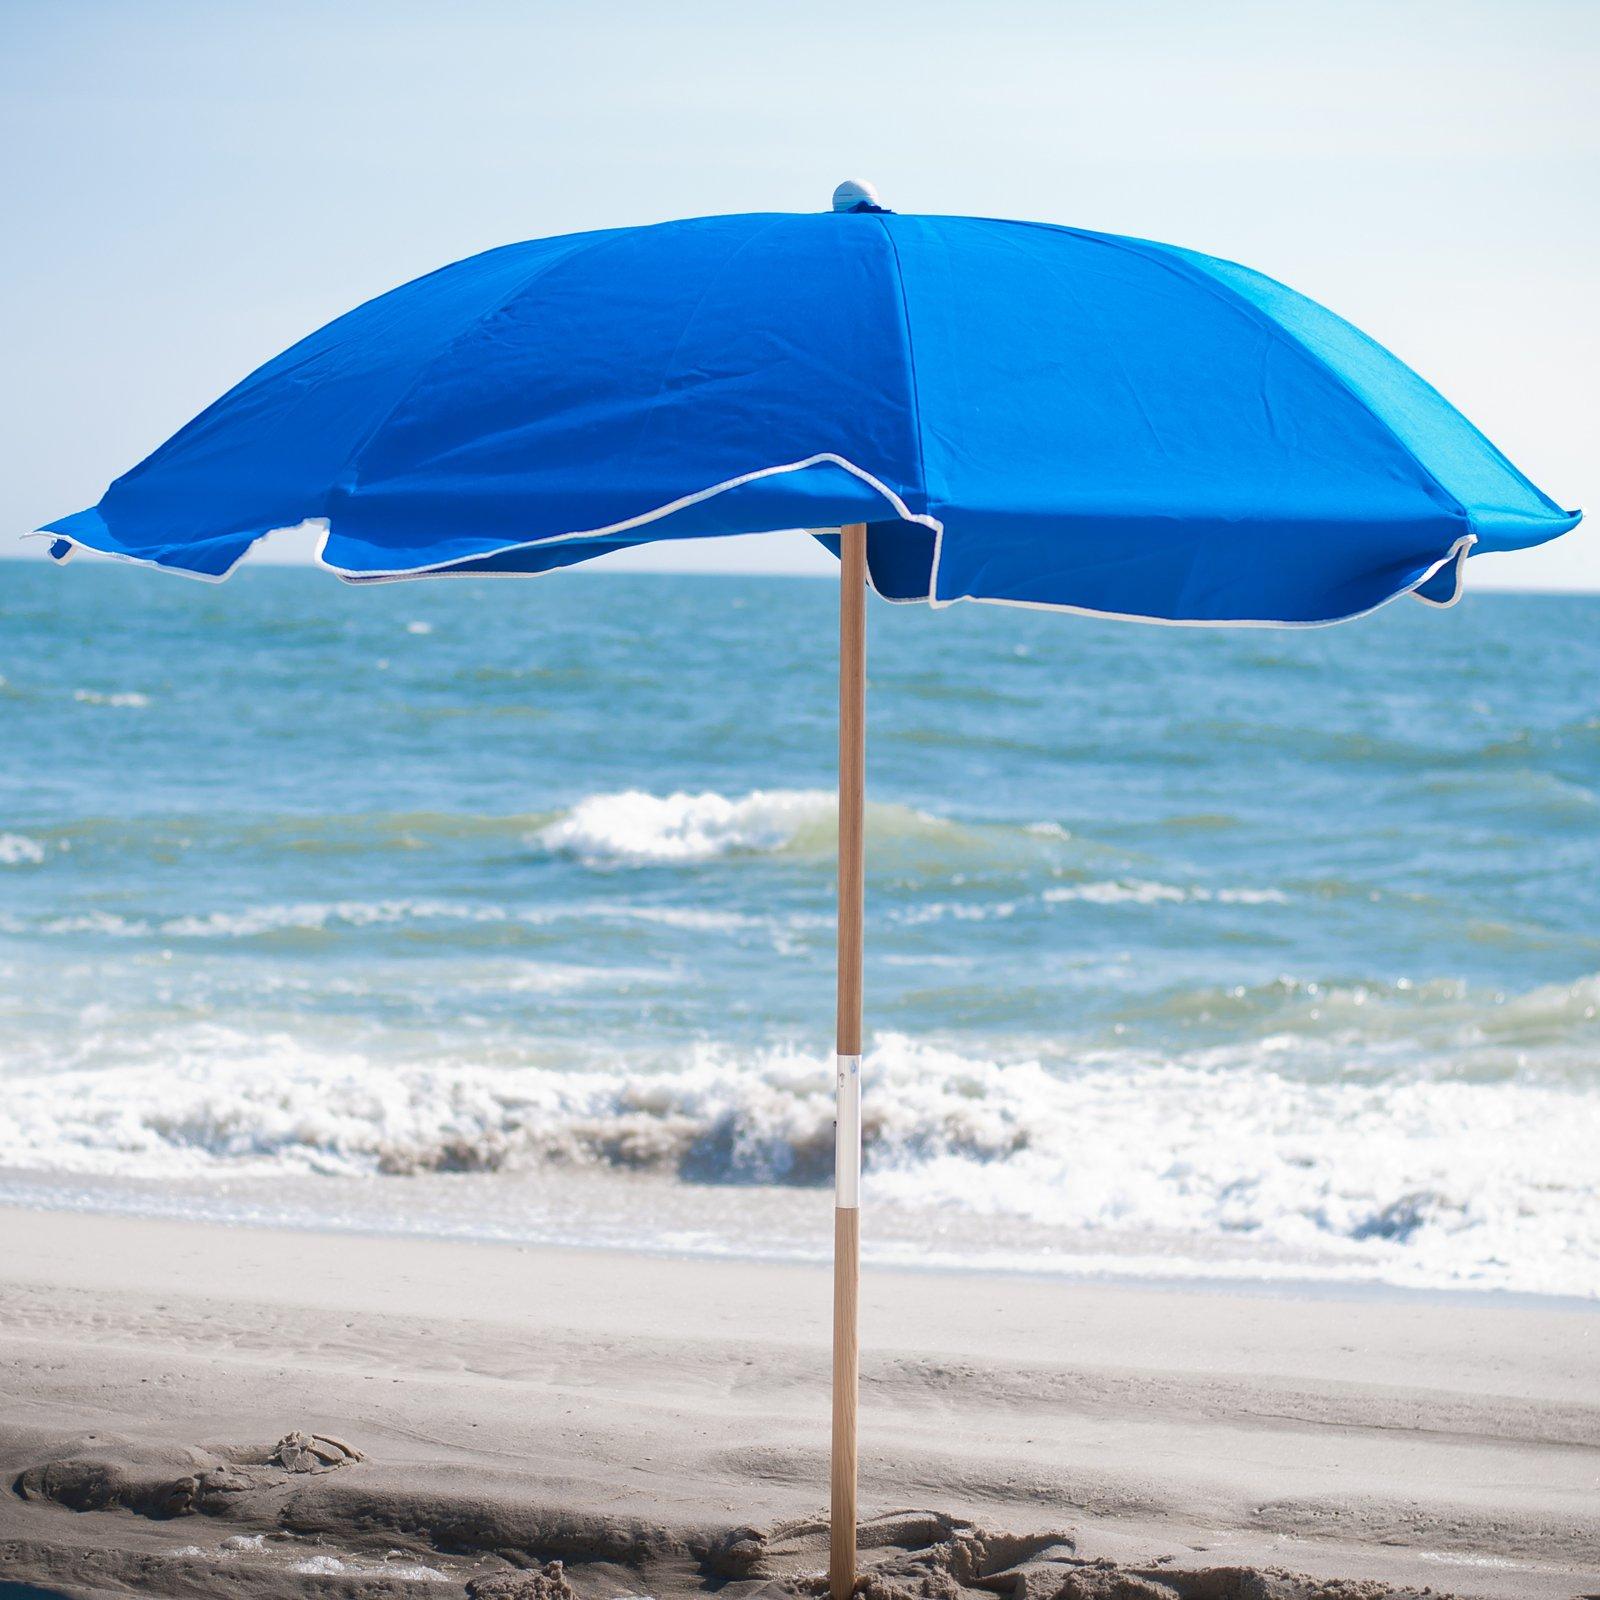 Frankford Umbrella Avalon Collection 7.5 ft. Commercial Fiberglass Beach Umbrella with Ashwood Pole